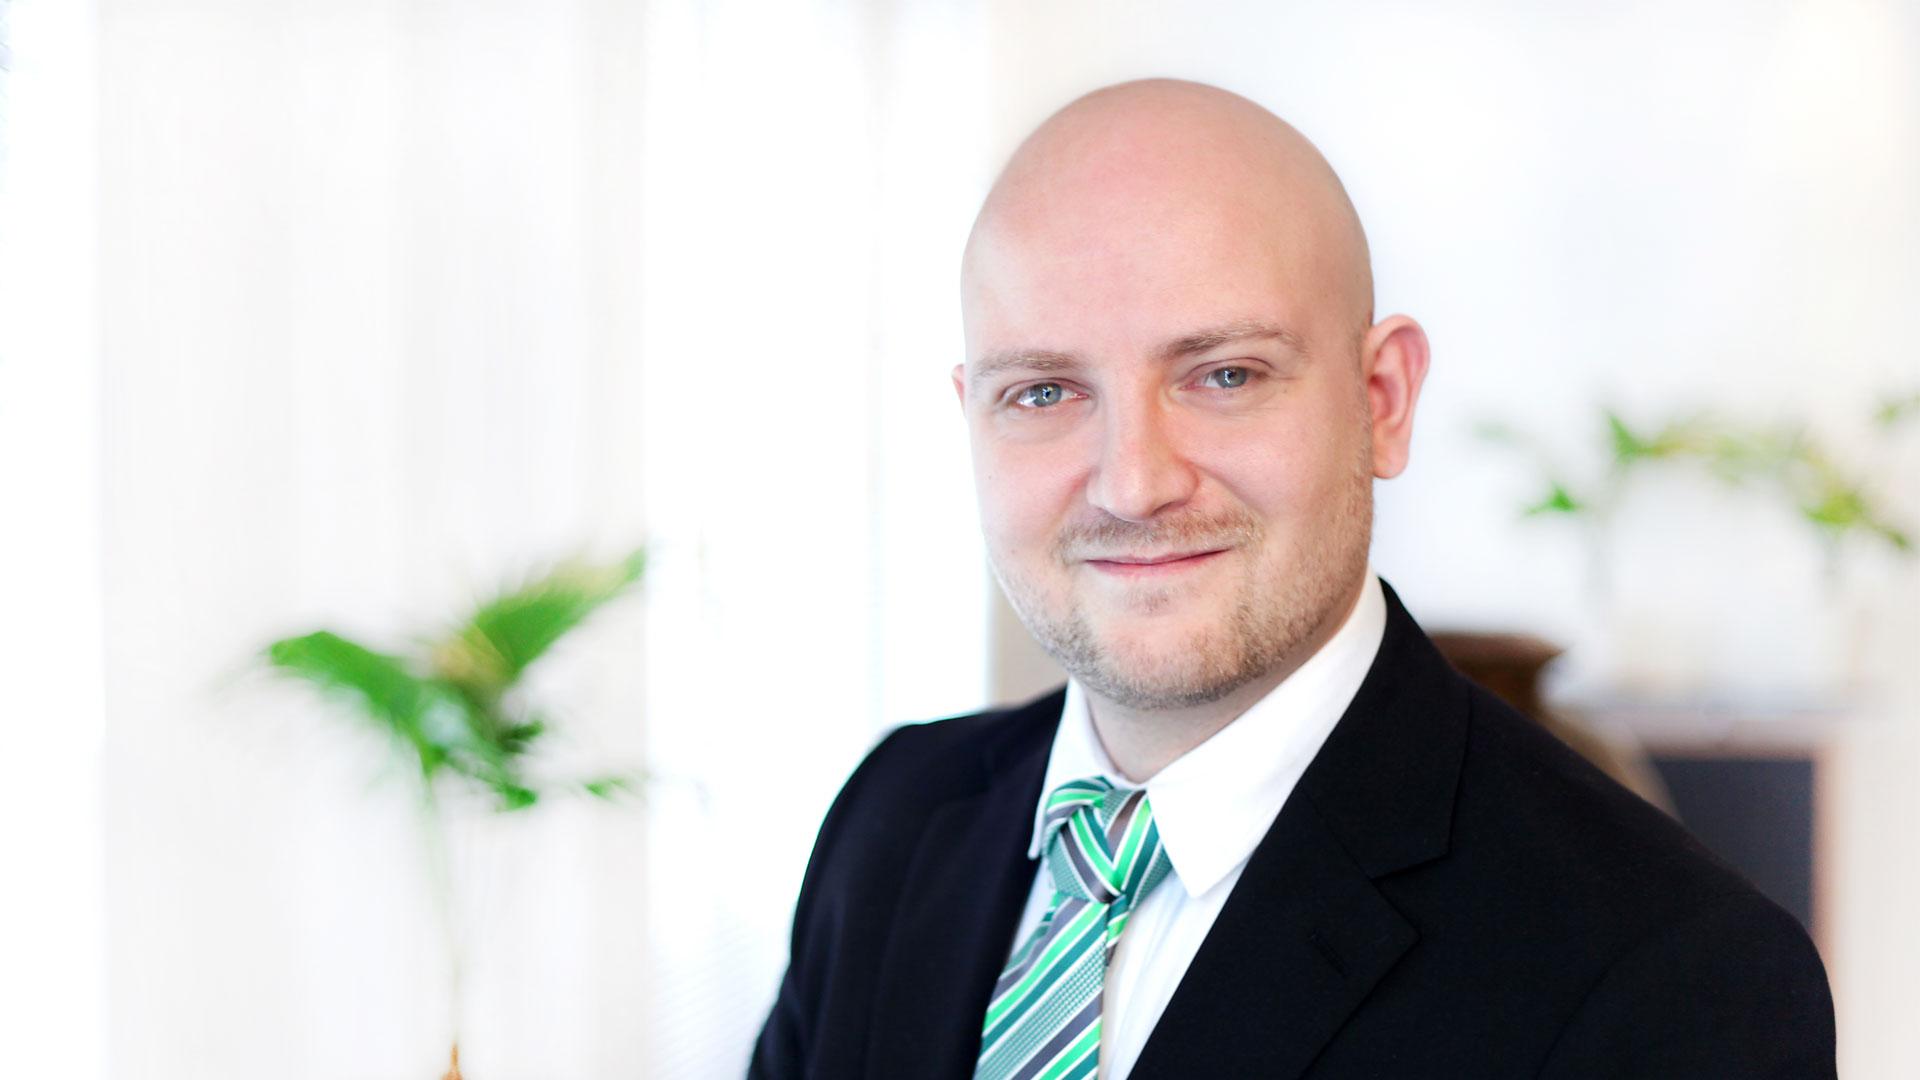 C-P-S Ingmar Wunderlich